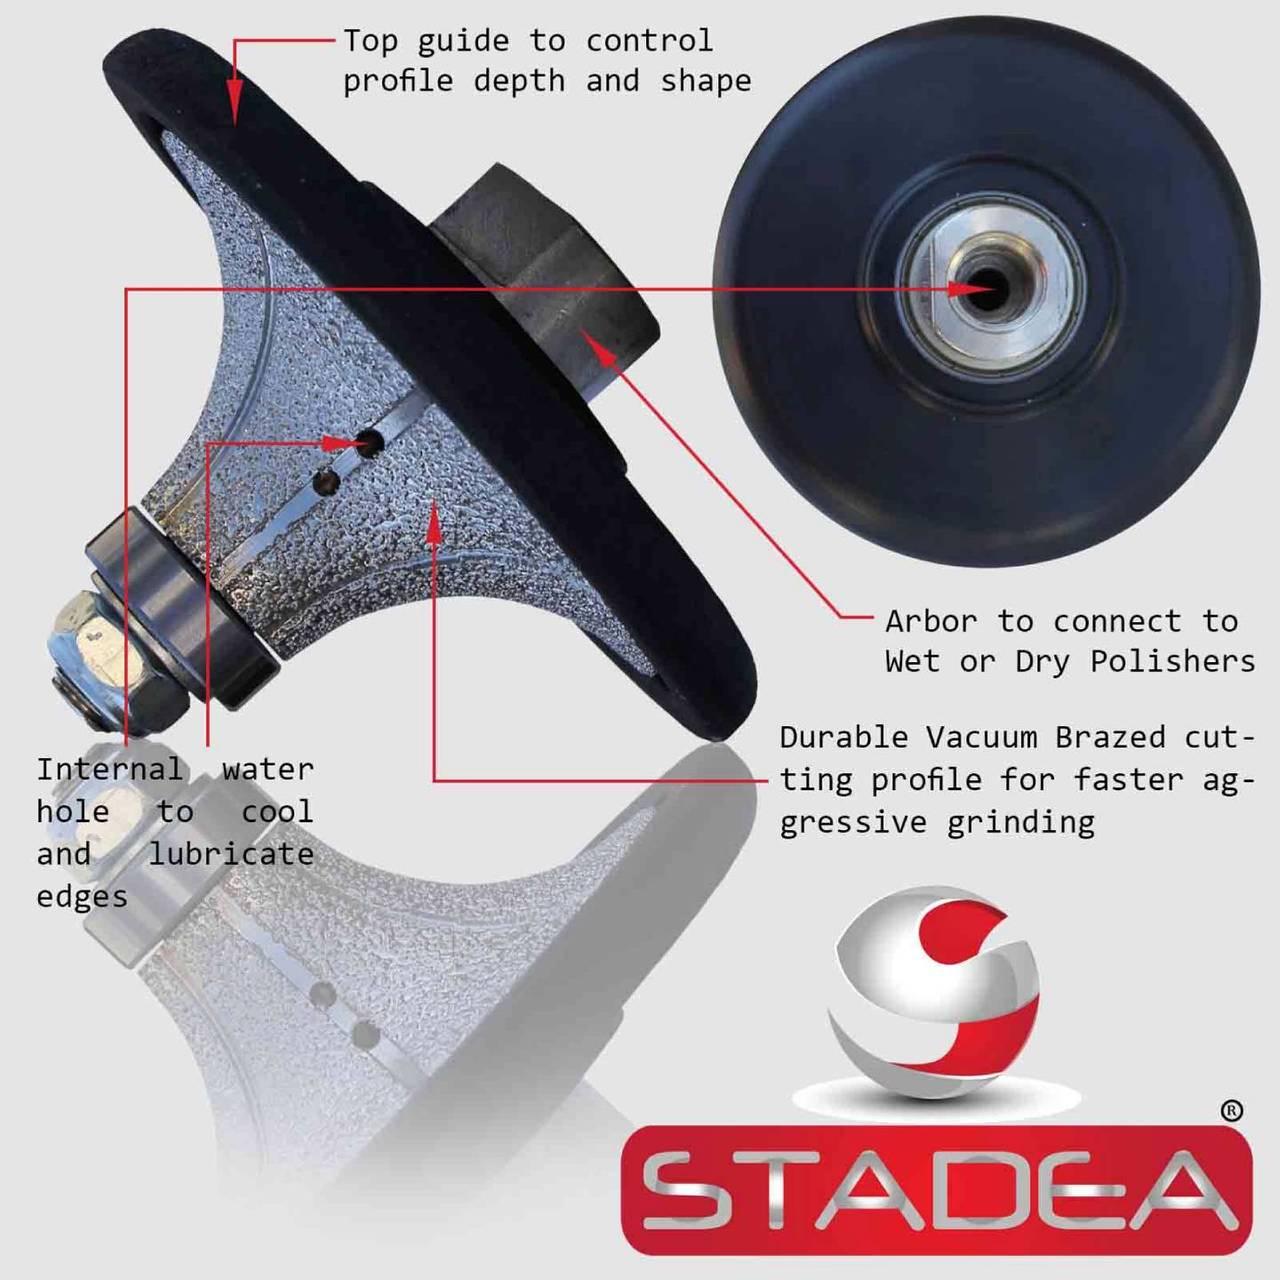 stadea diamond profile wheels radius half bullnose grinding shaping demi 1 1 4 grinder marble tile stone concrete profiling